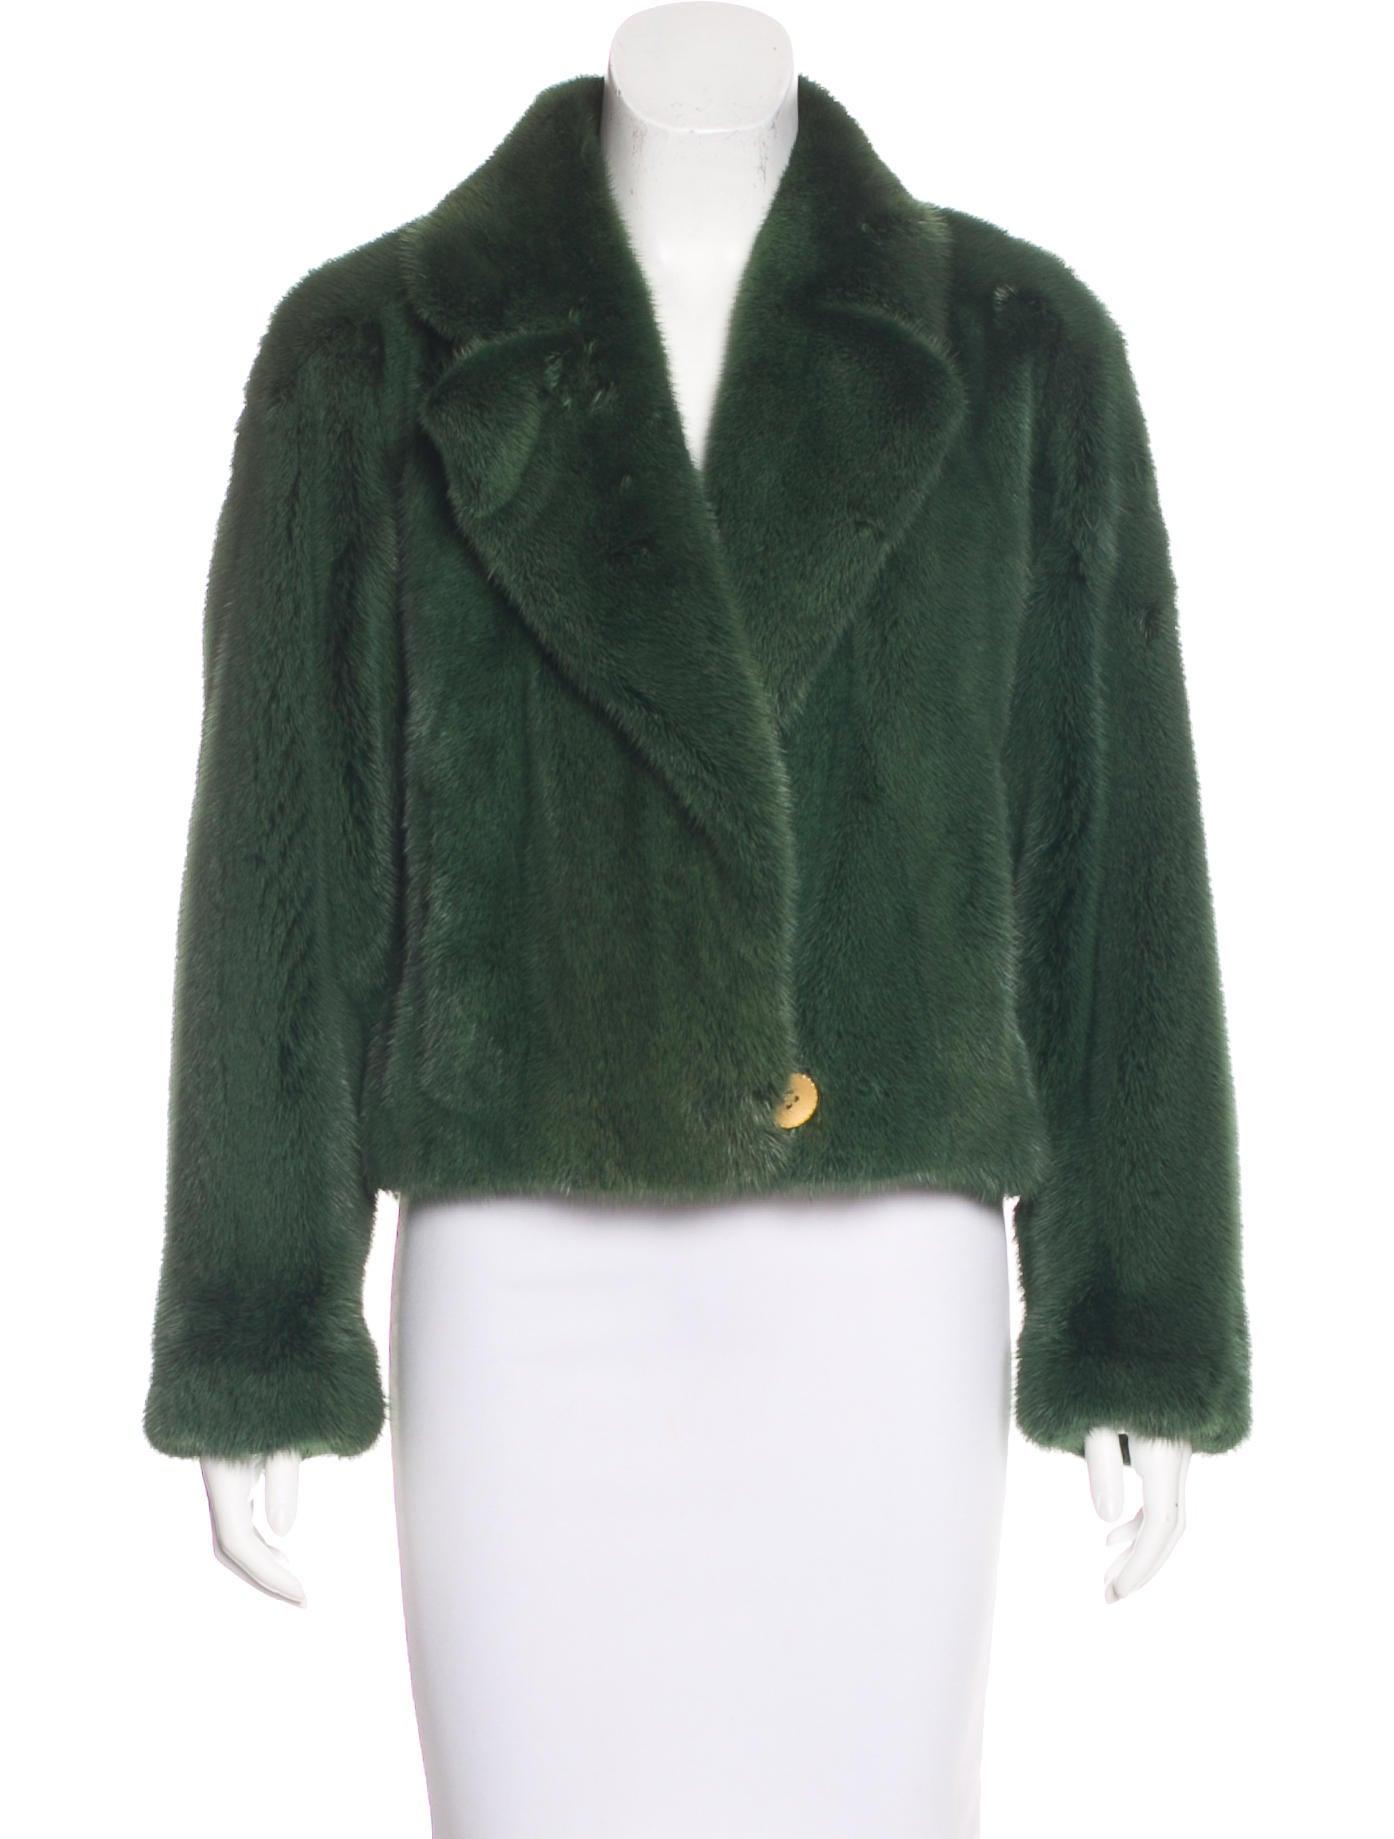 neiman marcus mink fur crop jacket clothing nemrc20258. Black Bedroom Furniture Sets. Home Design Ideas